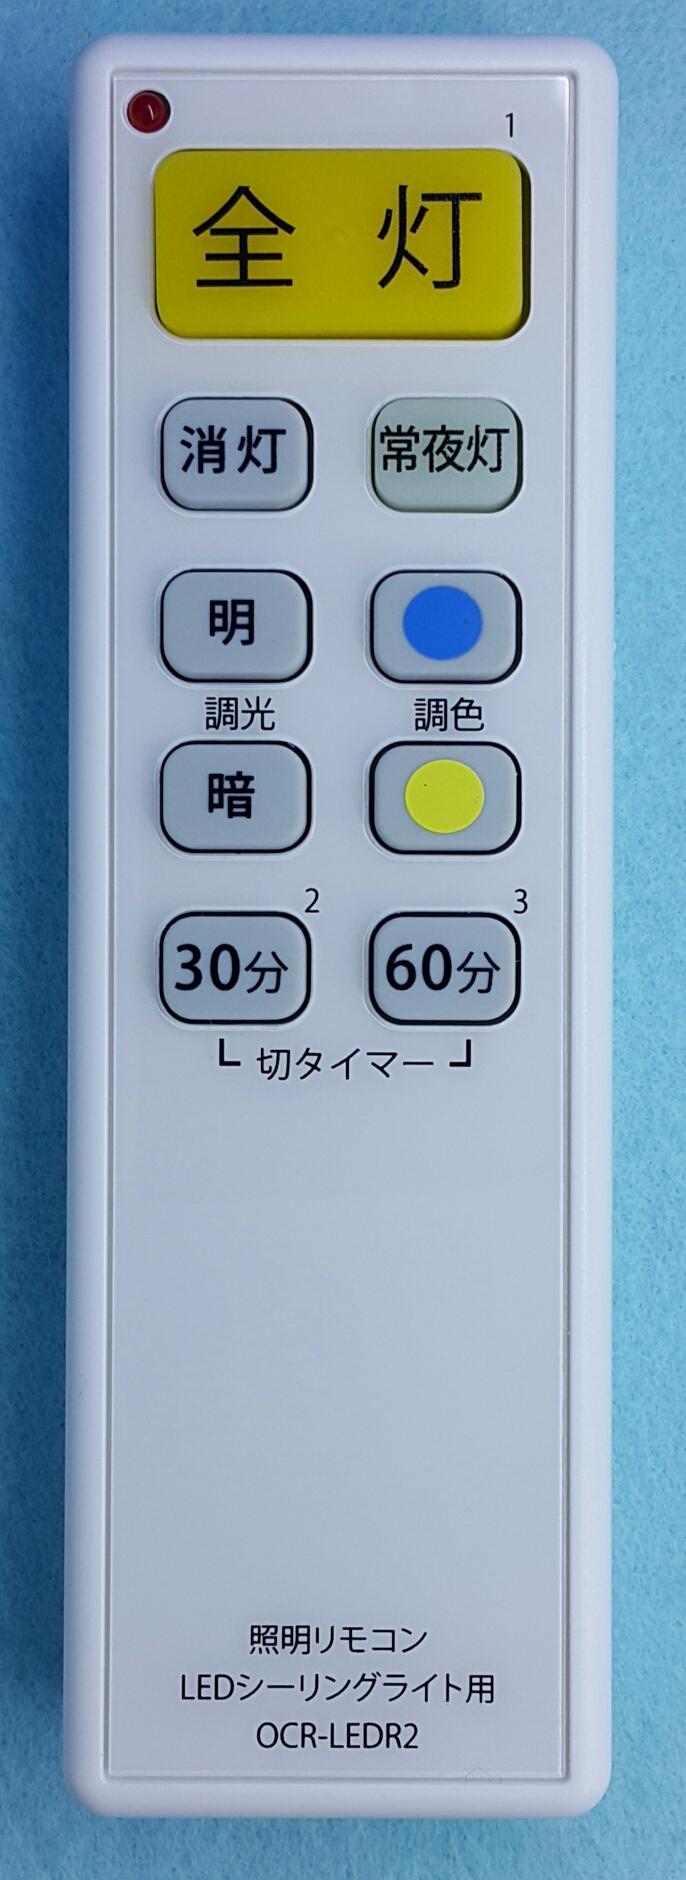 DOSHISHA_OCR-LEDR2_2113_LC02F 38C7_LAMP_cover.png